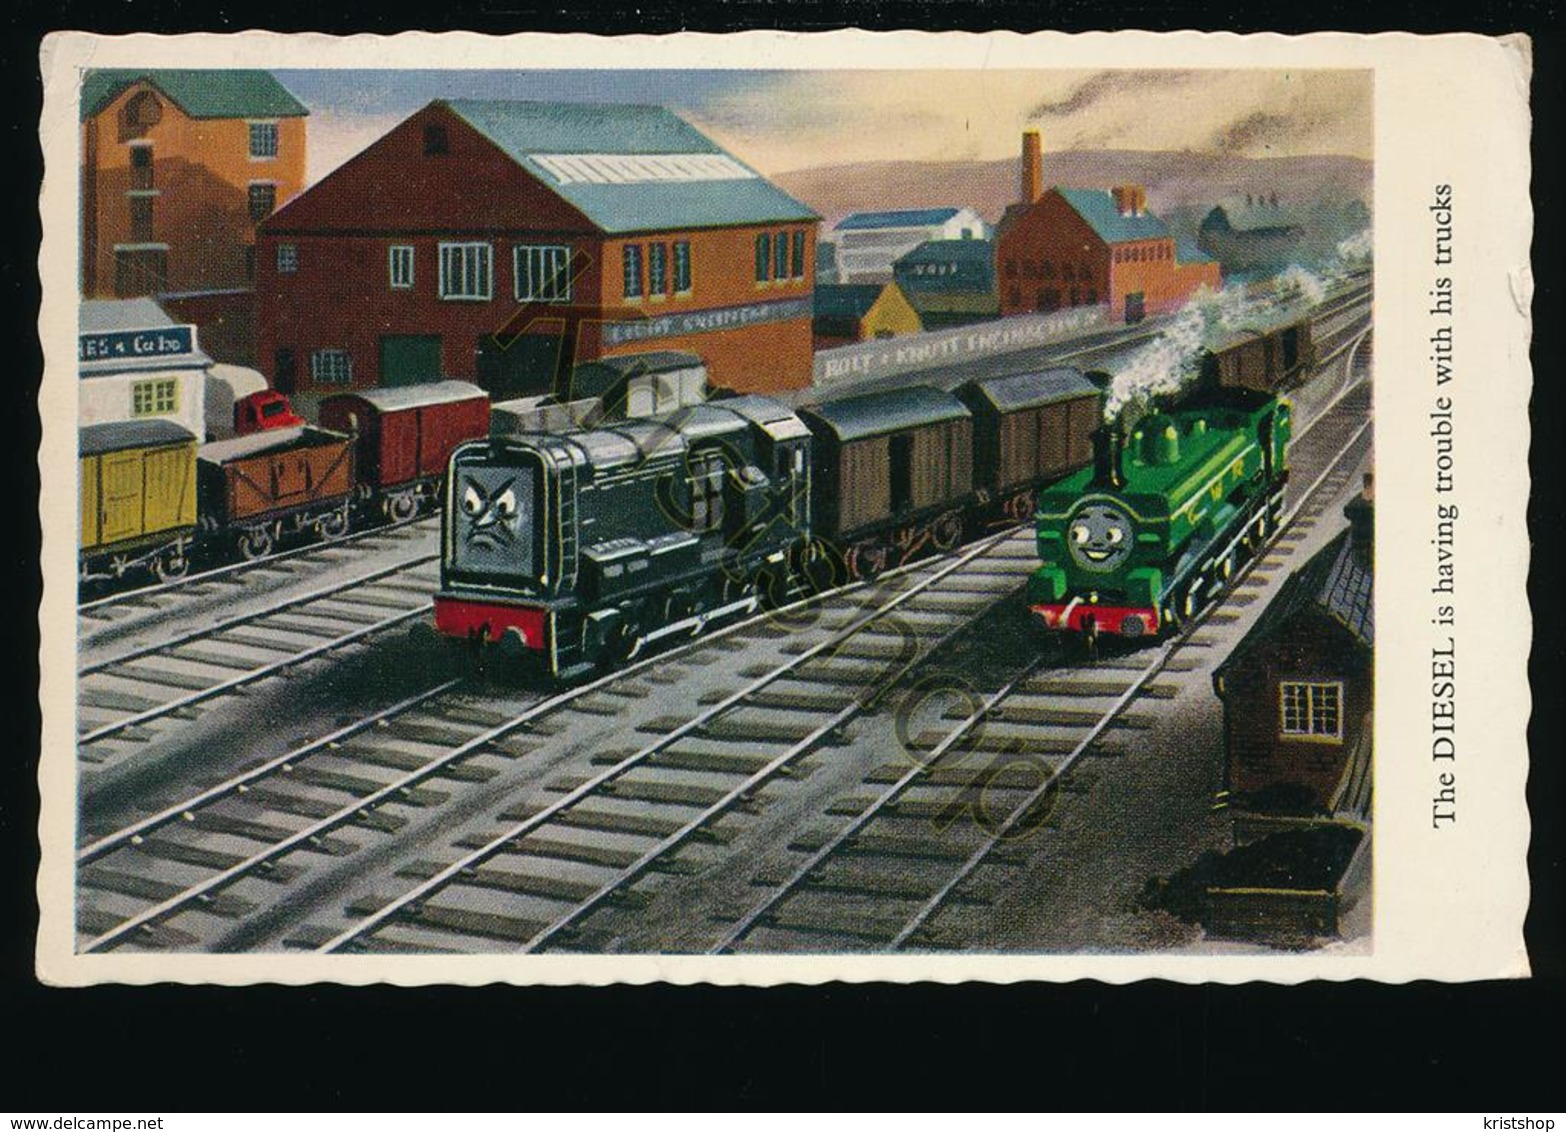 Bromley & Beckenham - The Diesel (train) [AA31 6.195 - Sin Clasificación